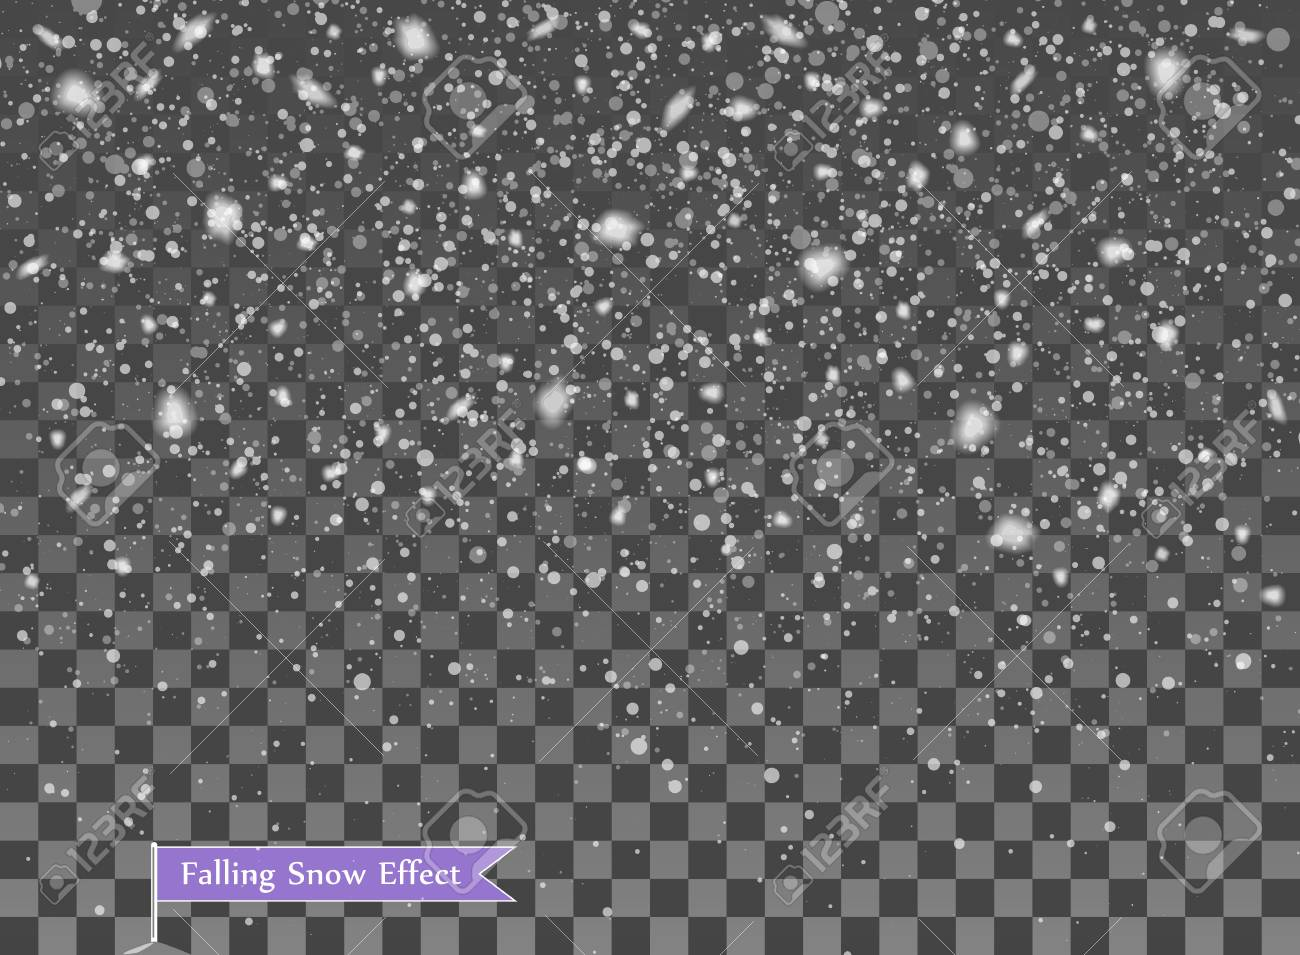 Falling snow, random elements. New year, Christmas decor overlay. Vector illustration on isolated transparent background. Eps. - 126779412